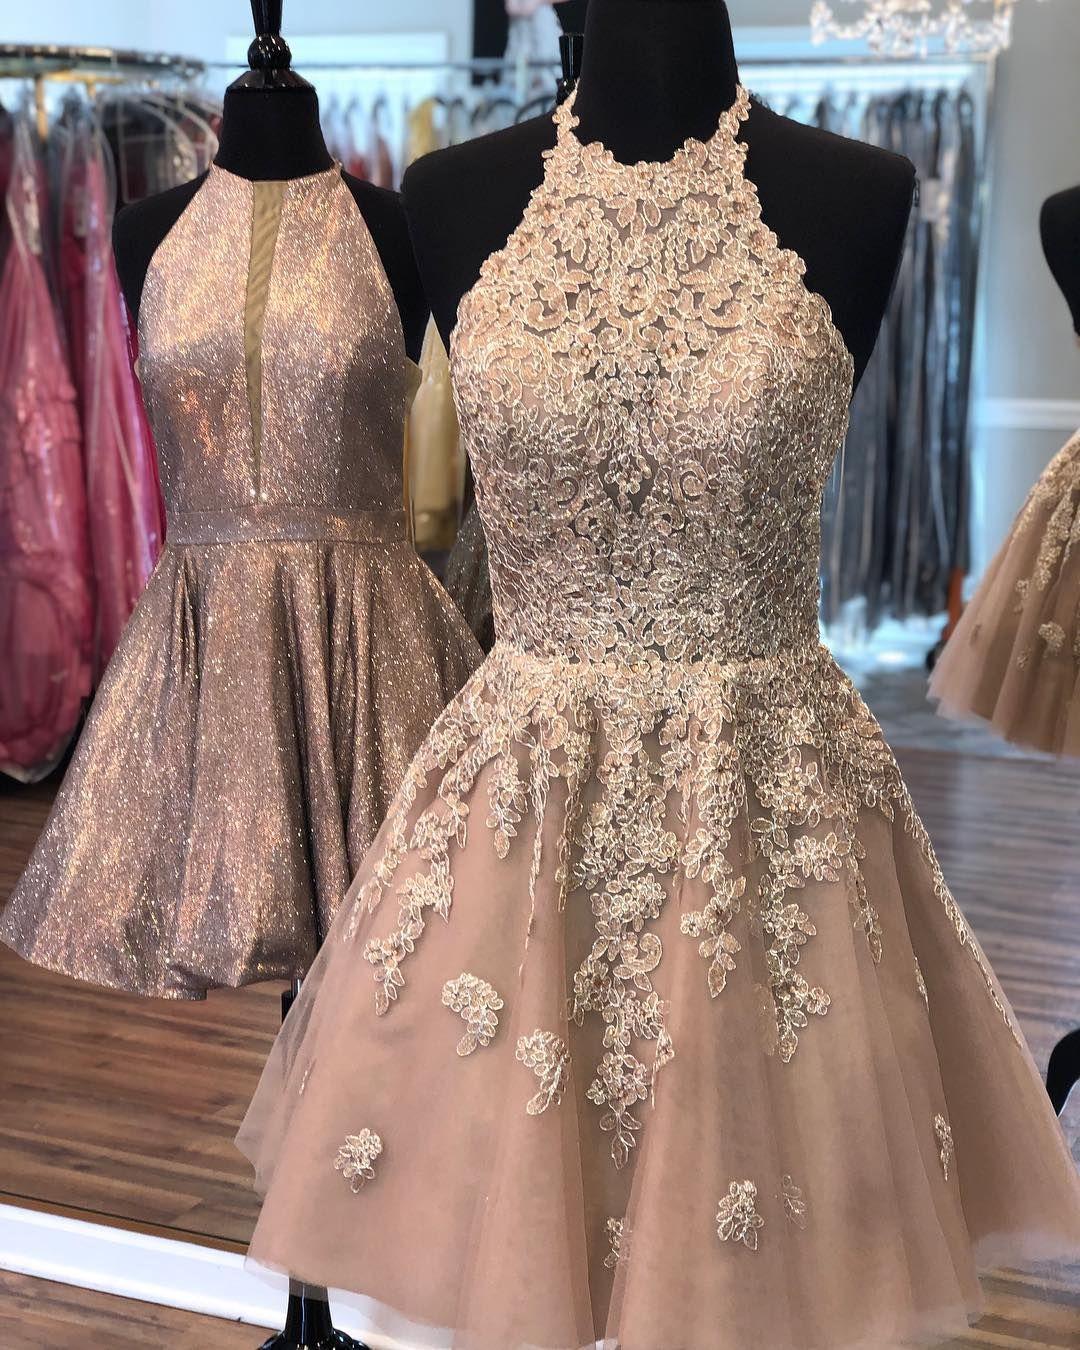 Gold Homecoming Dress Halter Homecoming Dress Appliques Girl Dress Short Prom Dresses Mini Homecoming Dresses Homecoming Dresses Elegant Party Dresses [ 1350 x 1080 Pixel ]